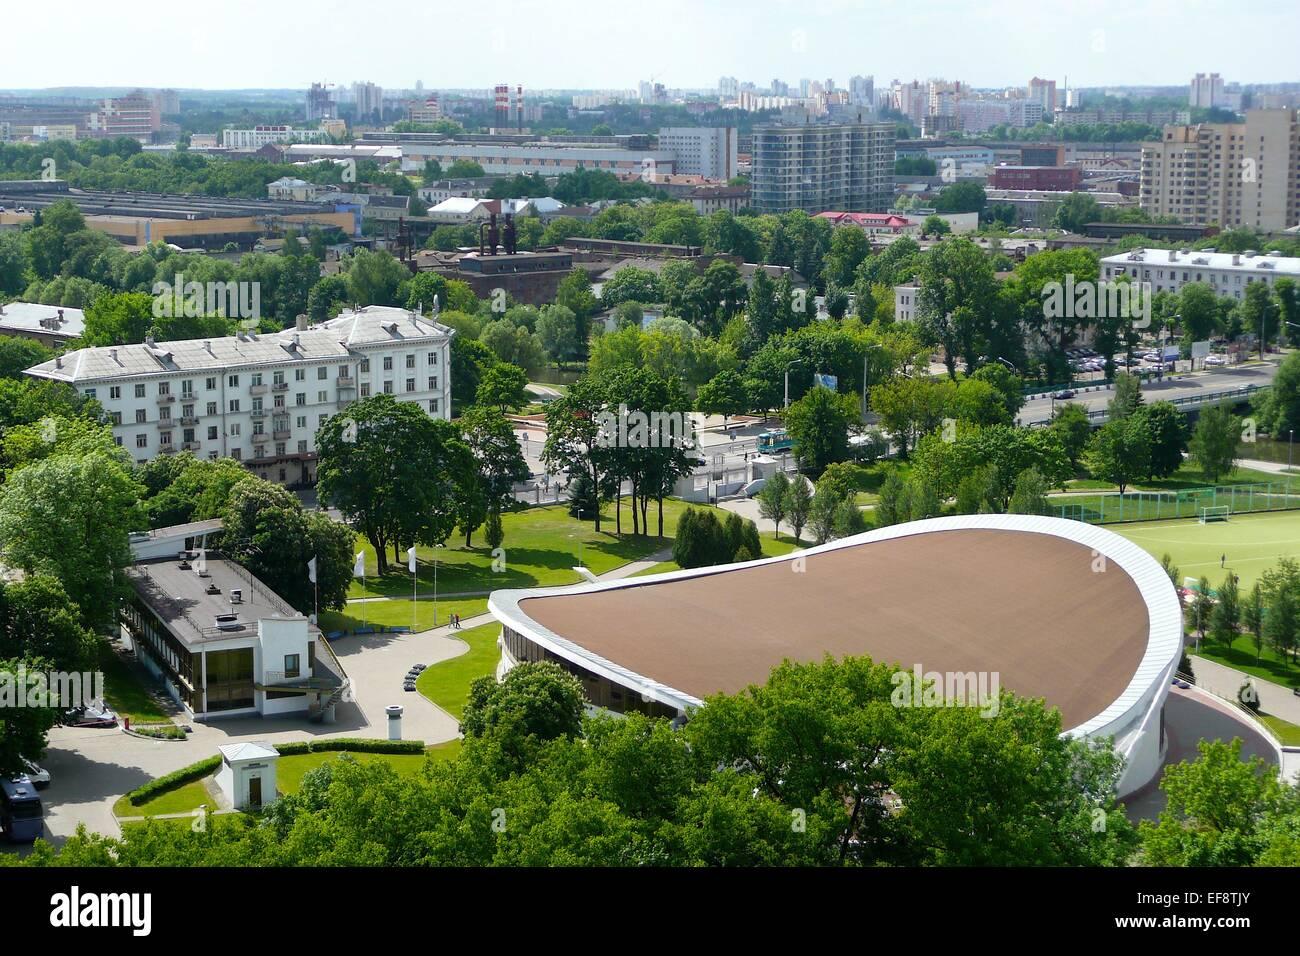 Belarus, Minsk, View of city - Stock Image